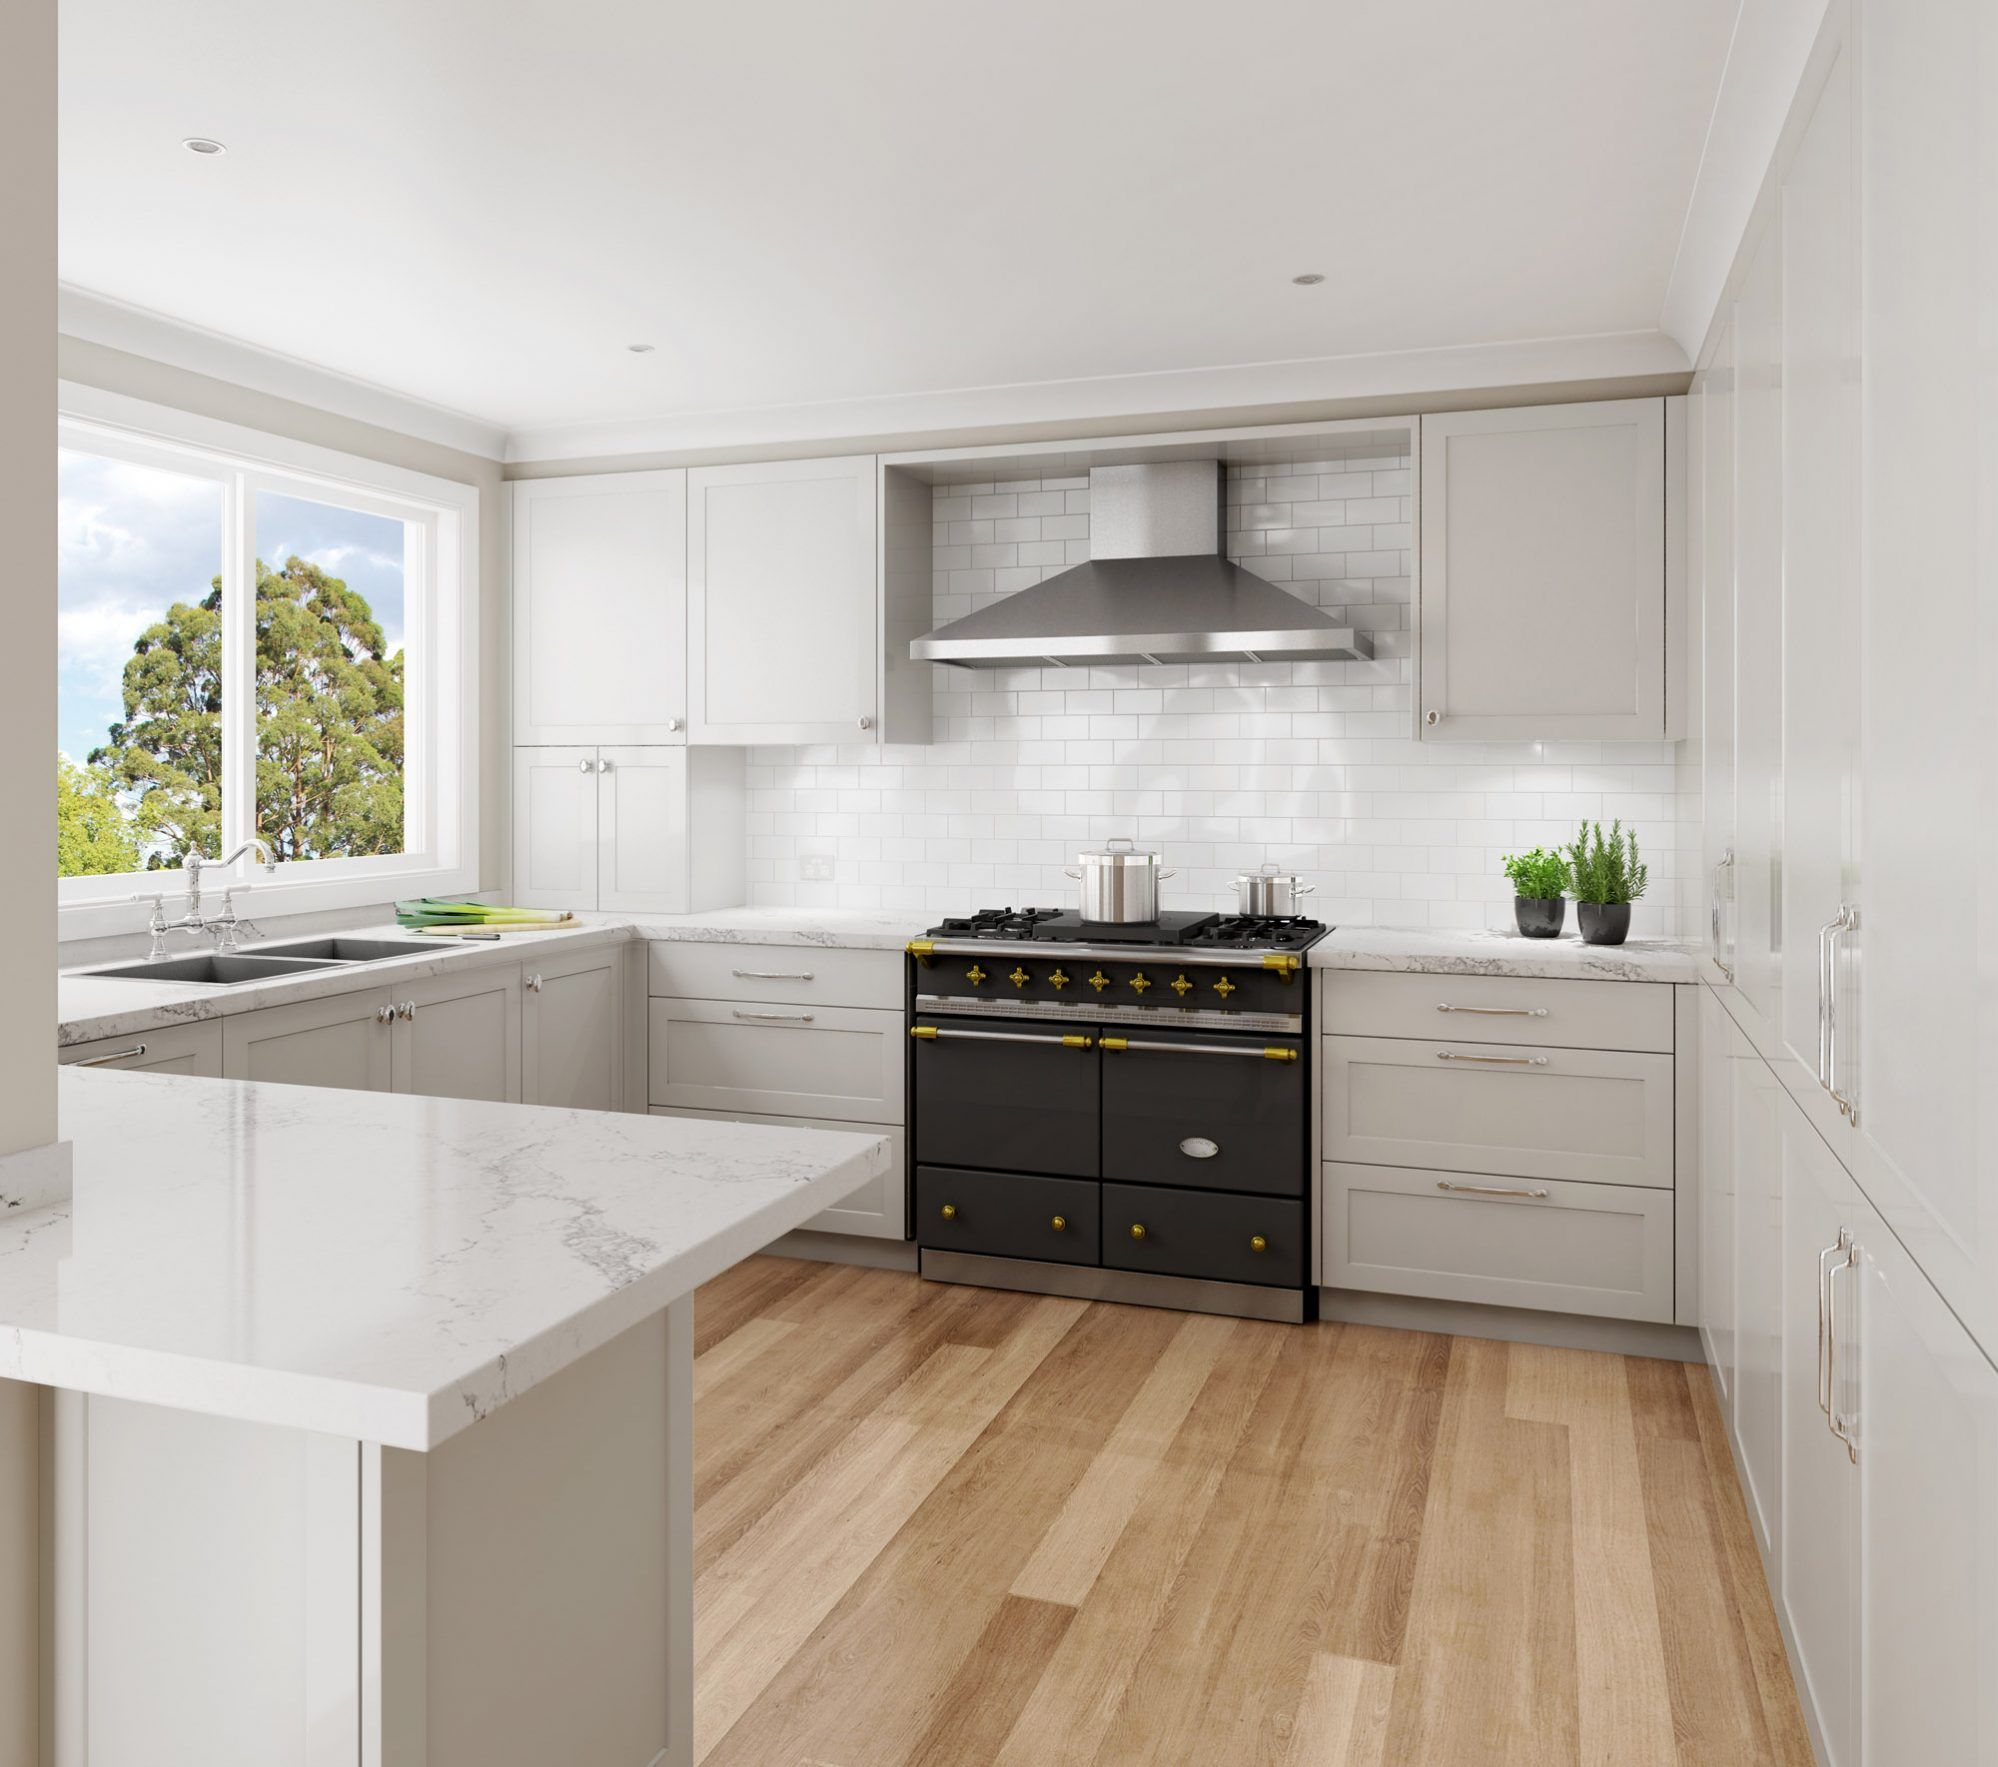 Shaker Style Kitchen Designs Sydney Kitchen Design Shaker Style